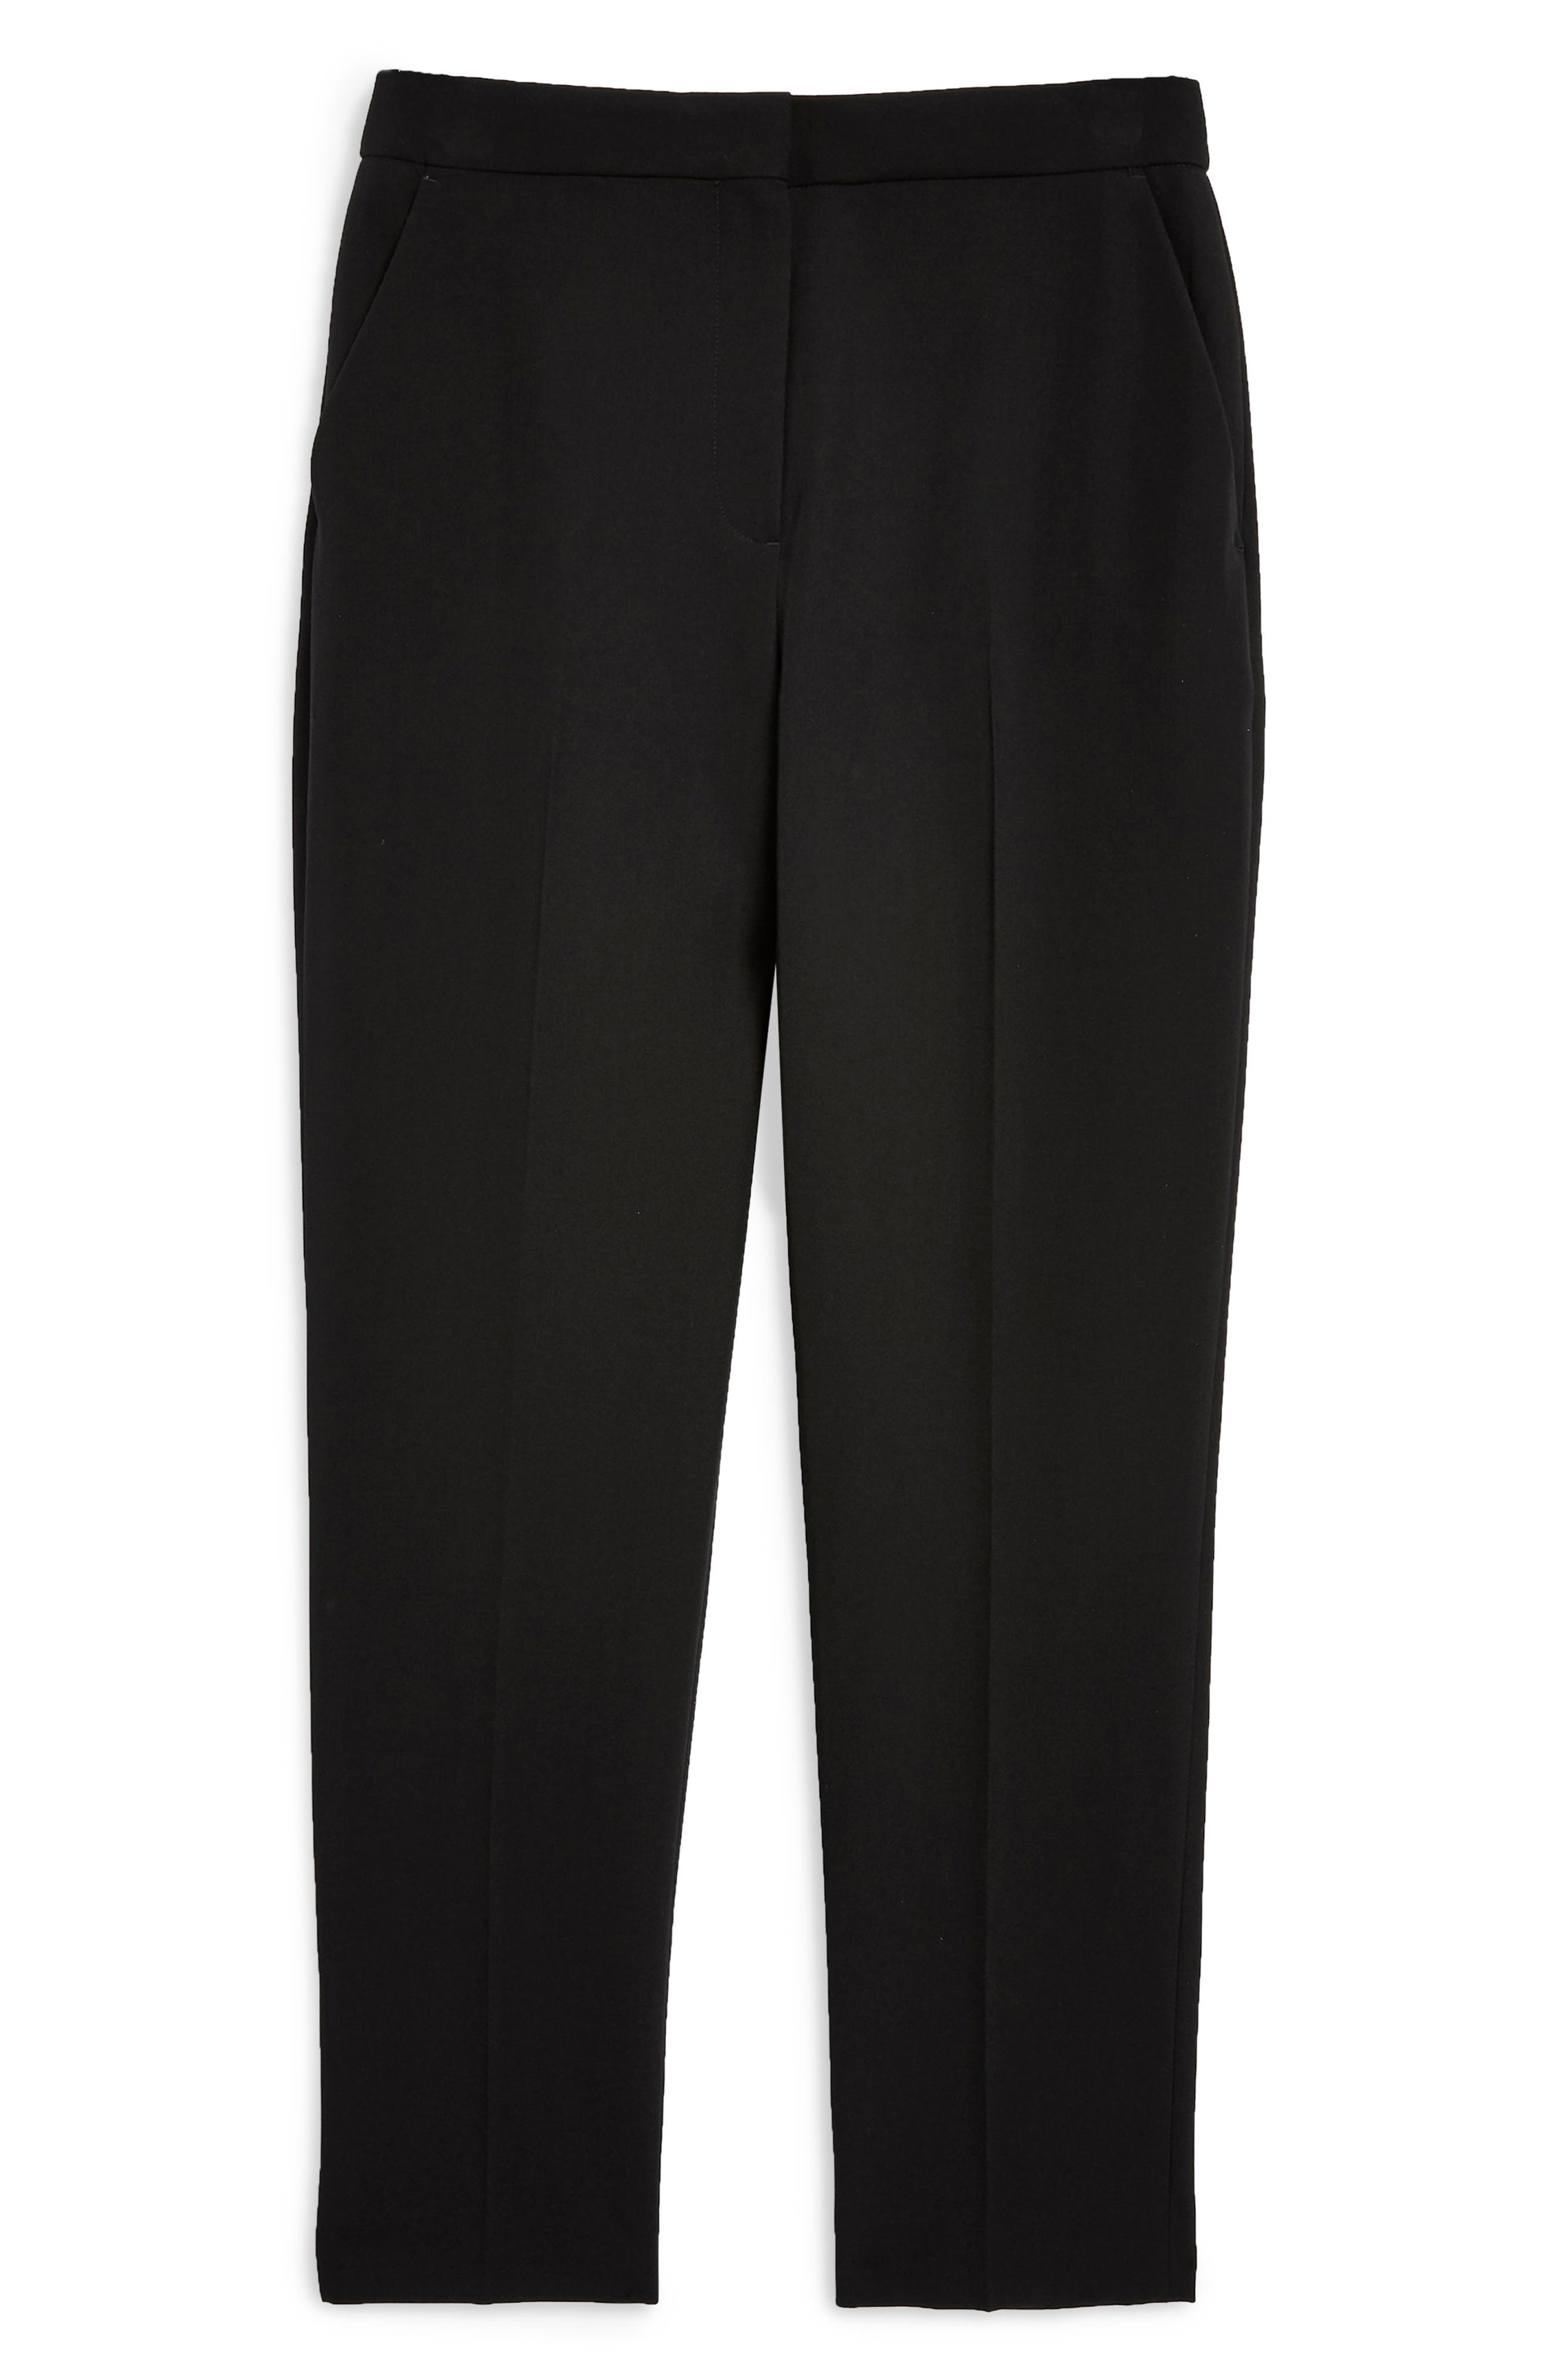 TOPSHOP, Kleo Trousers, Alternate thumbnail 5, color, BLACK